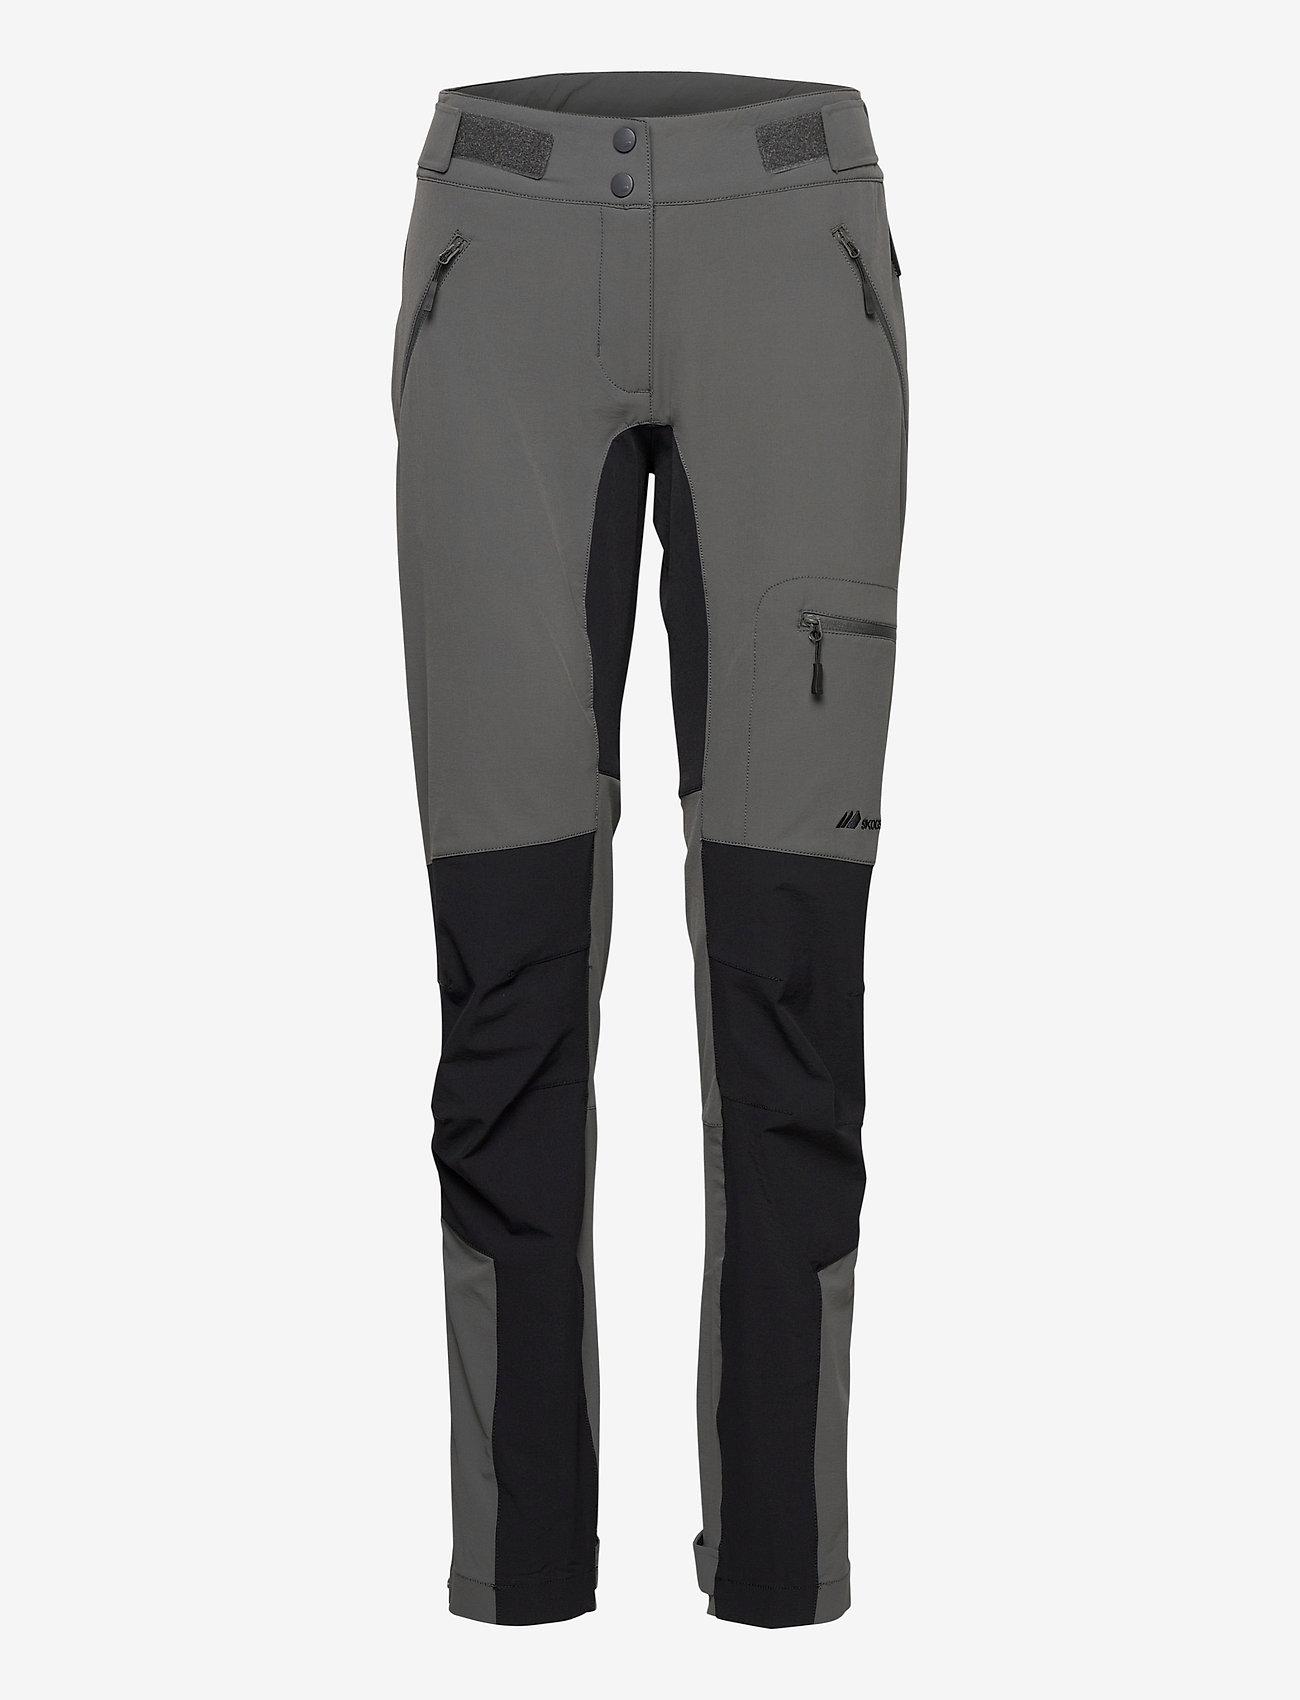 Skogstad - Ringstind hiking trouser - dark grey - 0